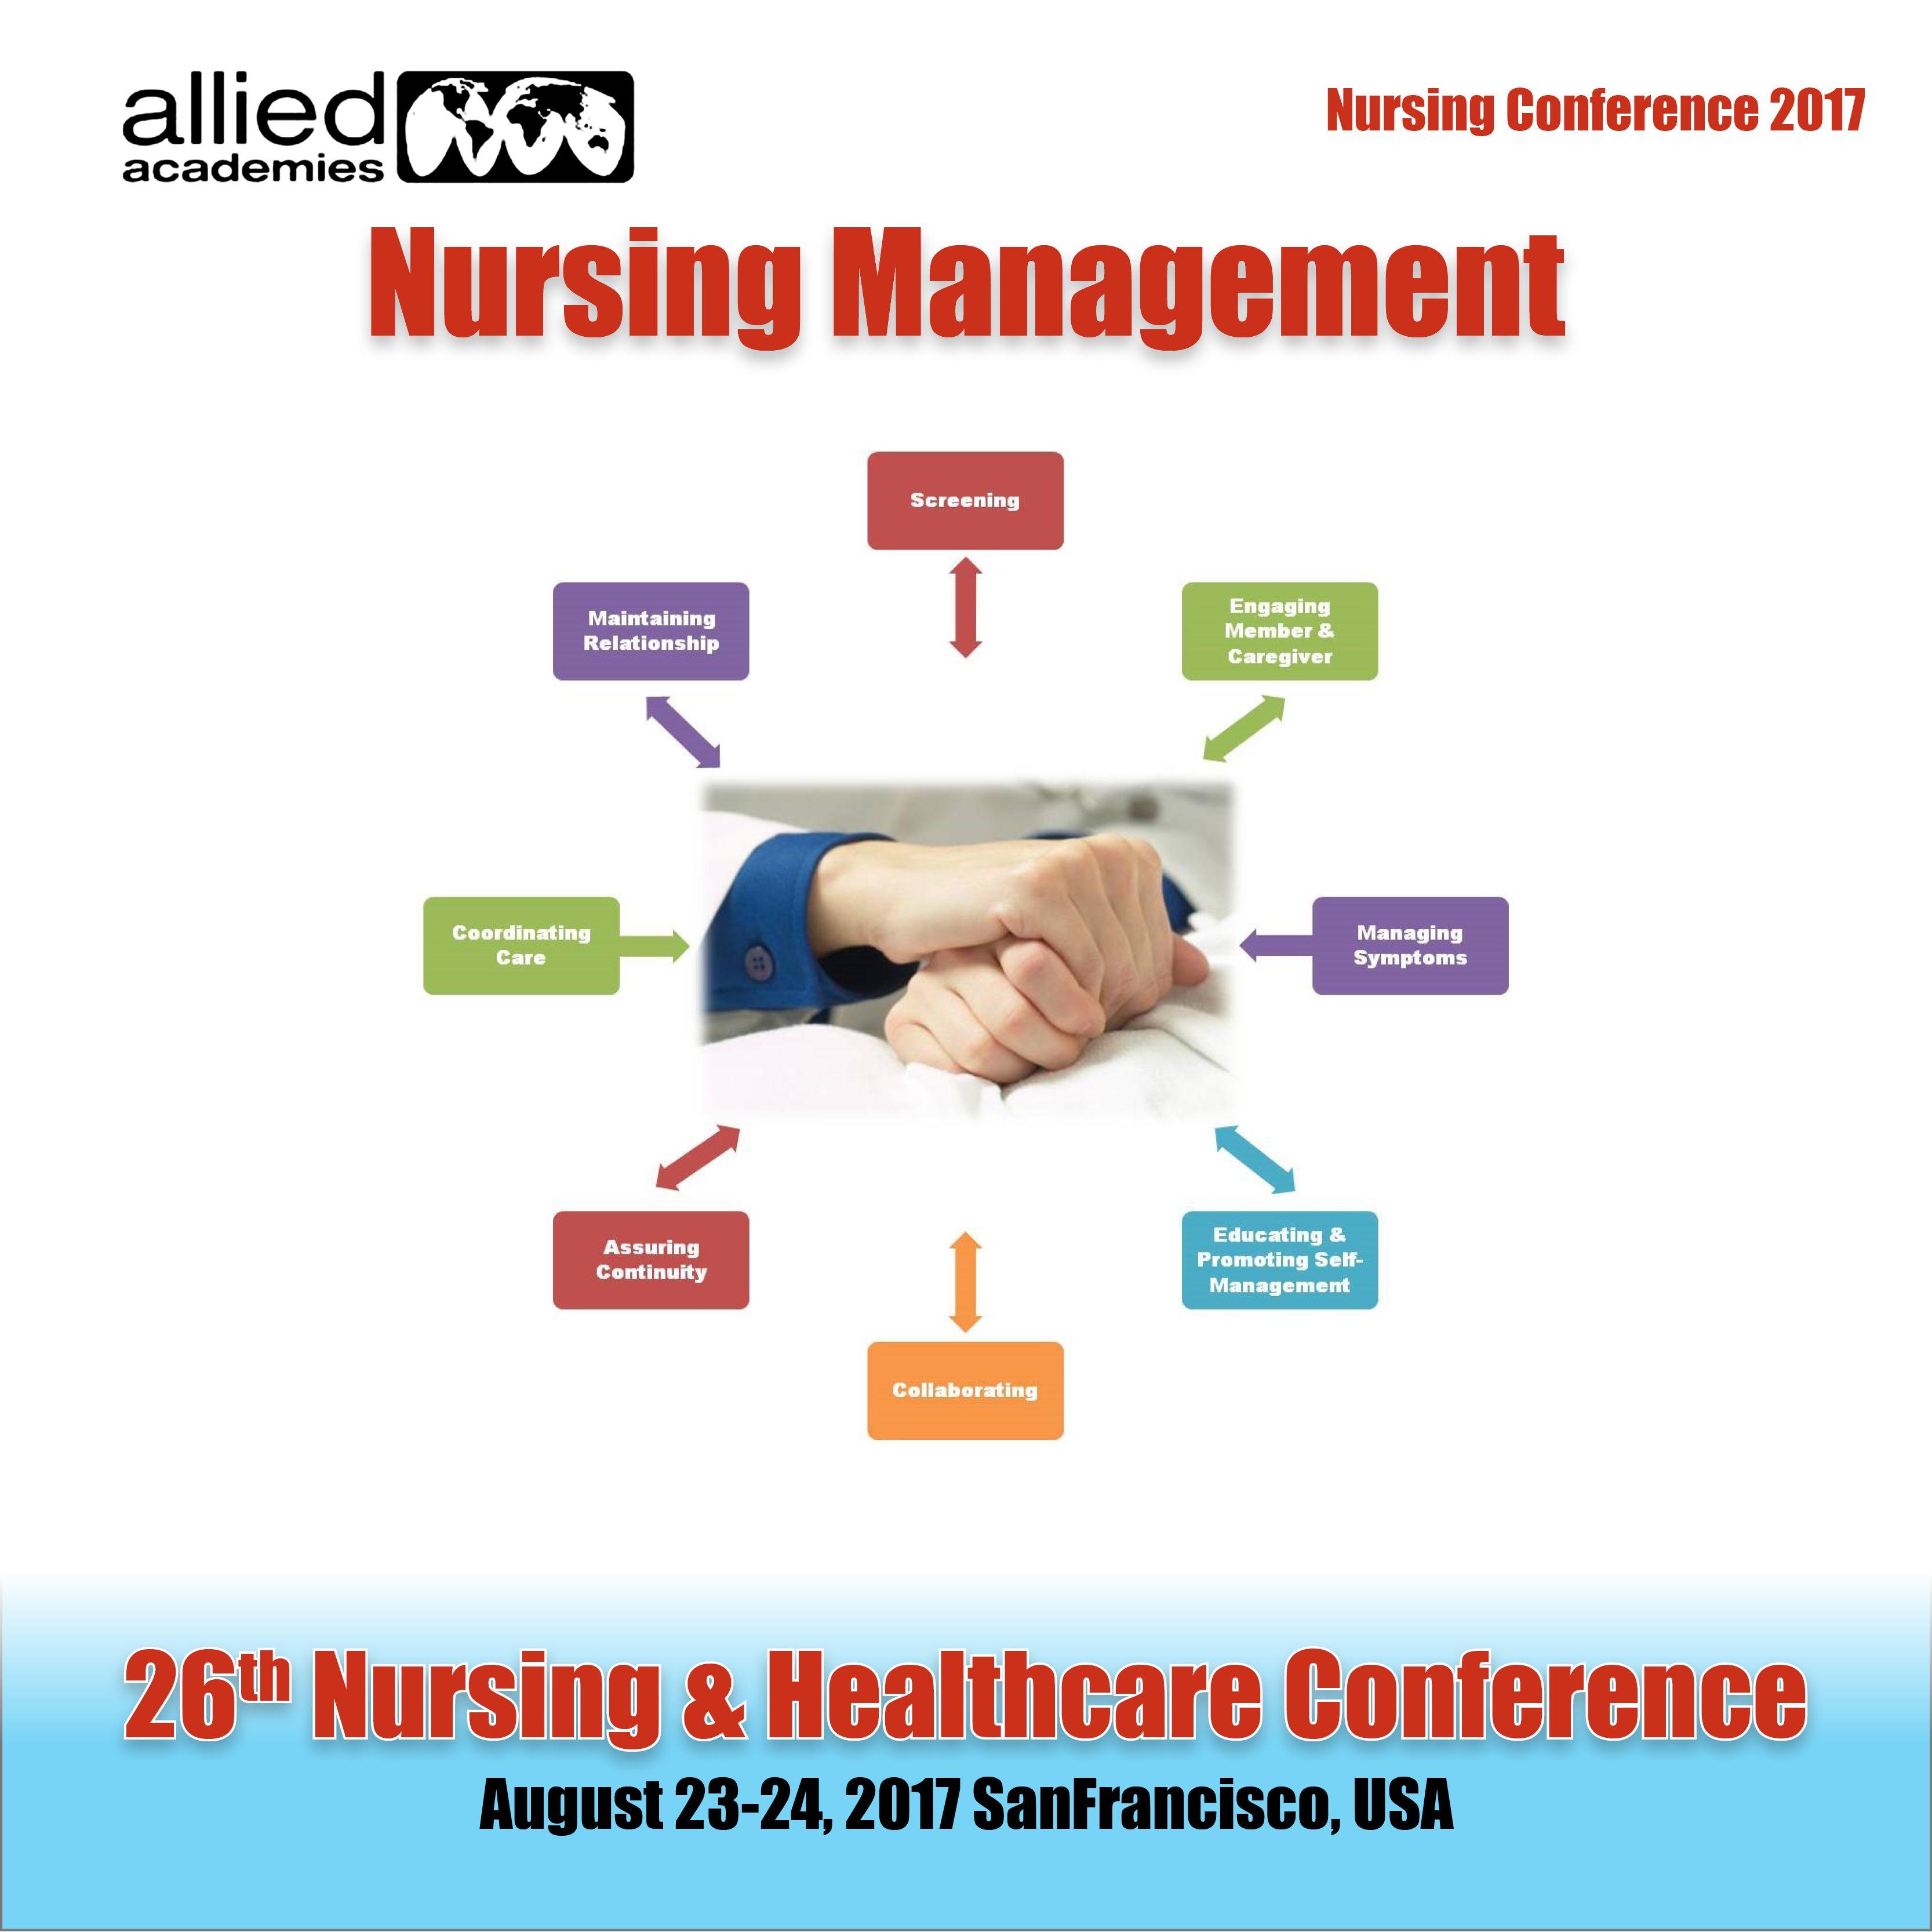 Nursing Management #Nursing management consists of the